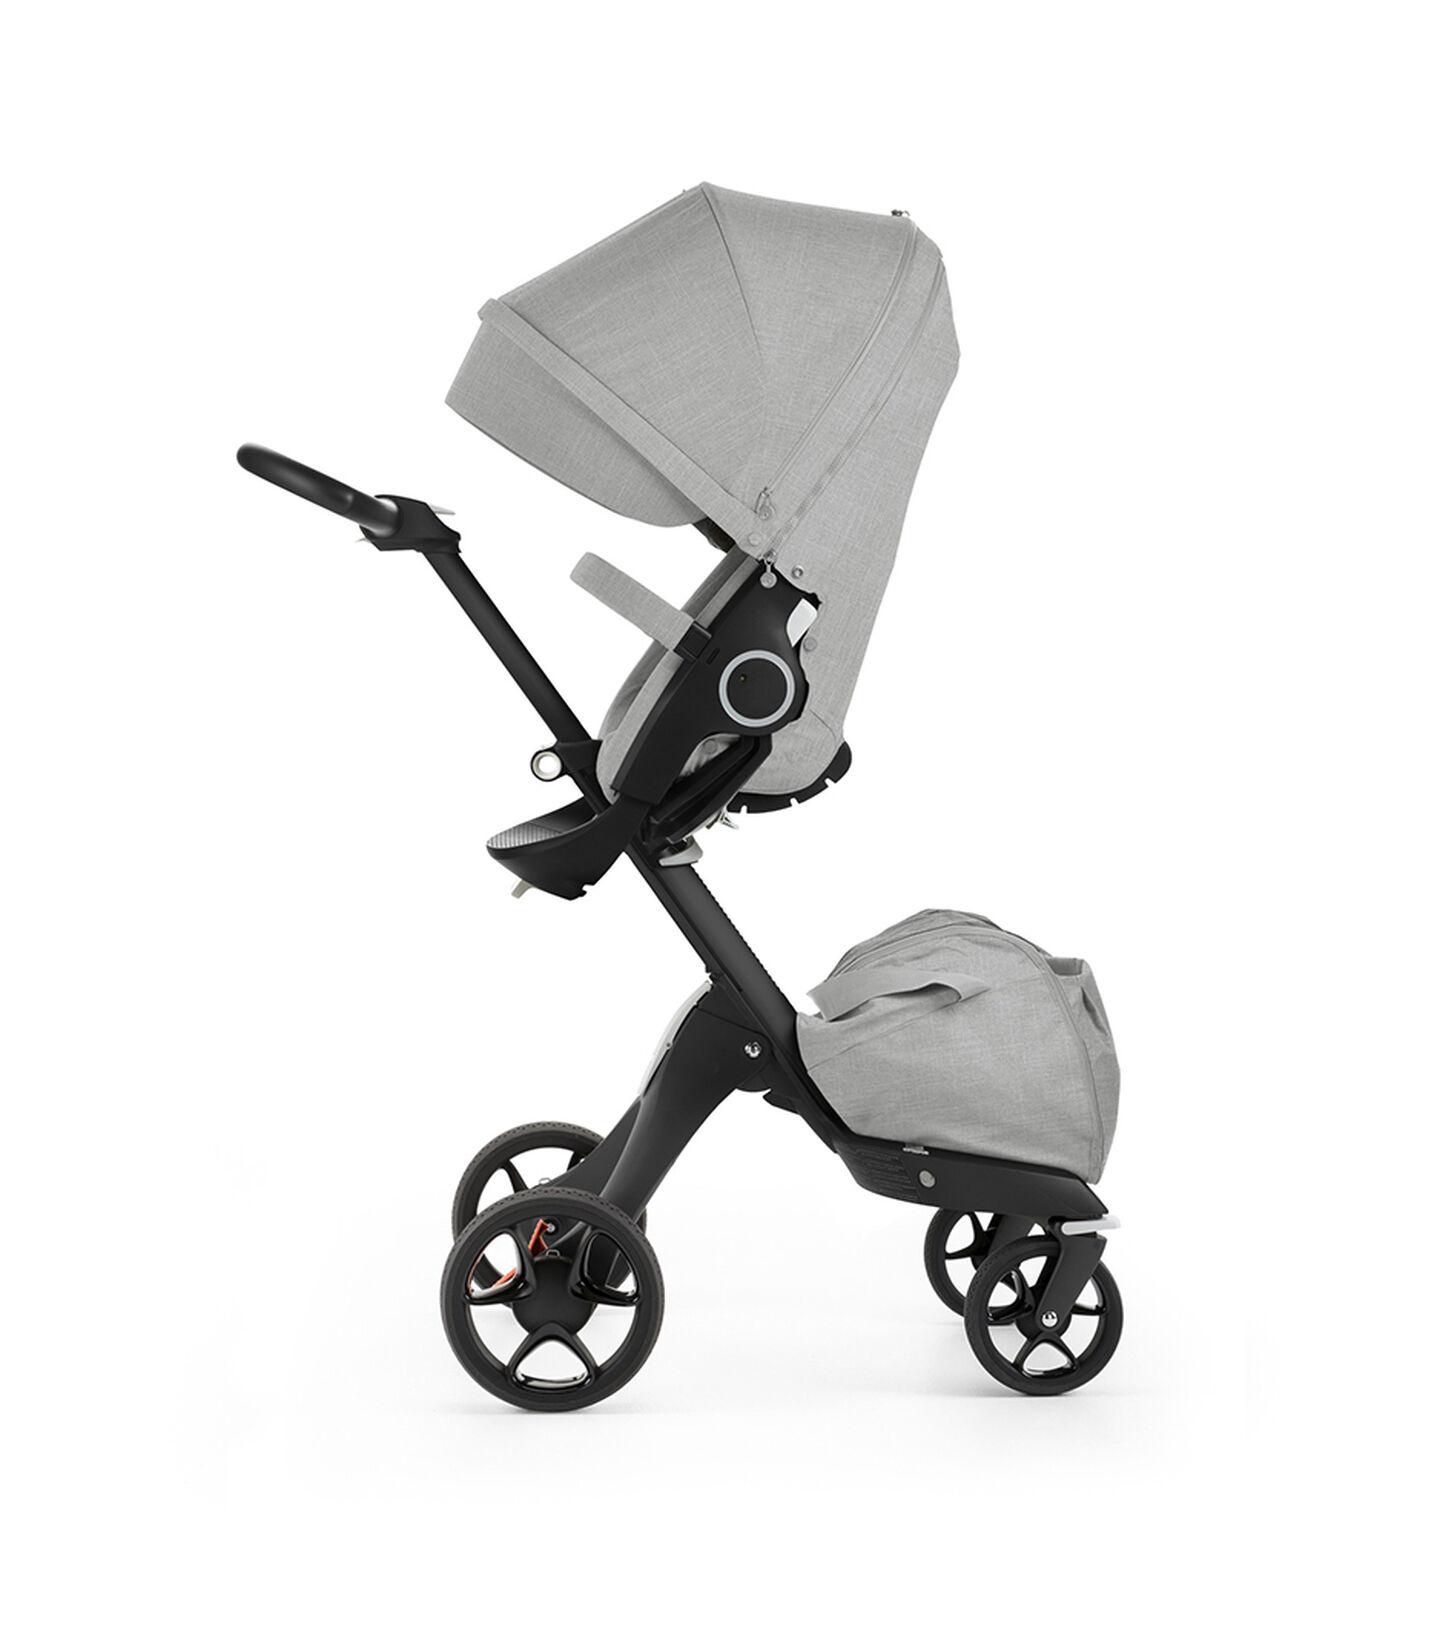 Stokke® Xplory® with Stokke® Stroller Seat, Black Melange. New wheels 2016.